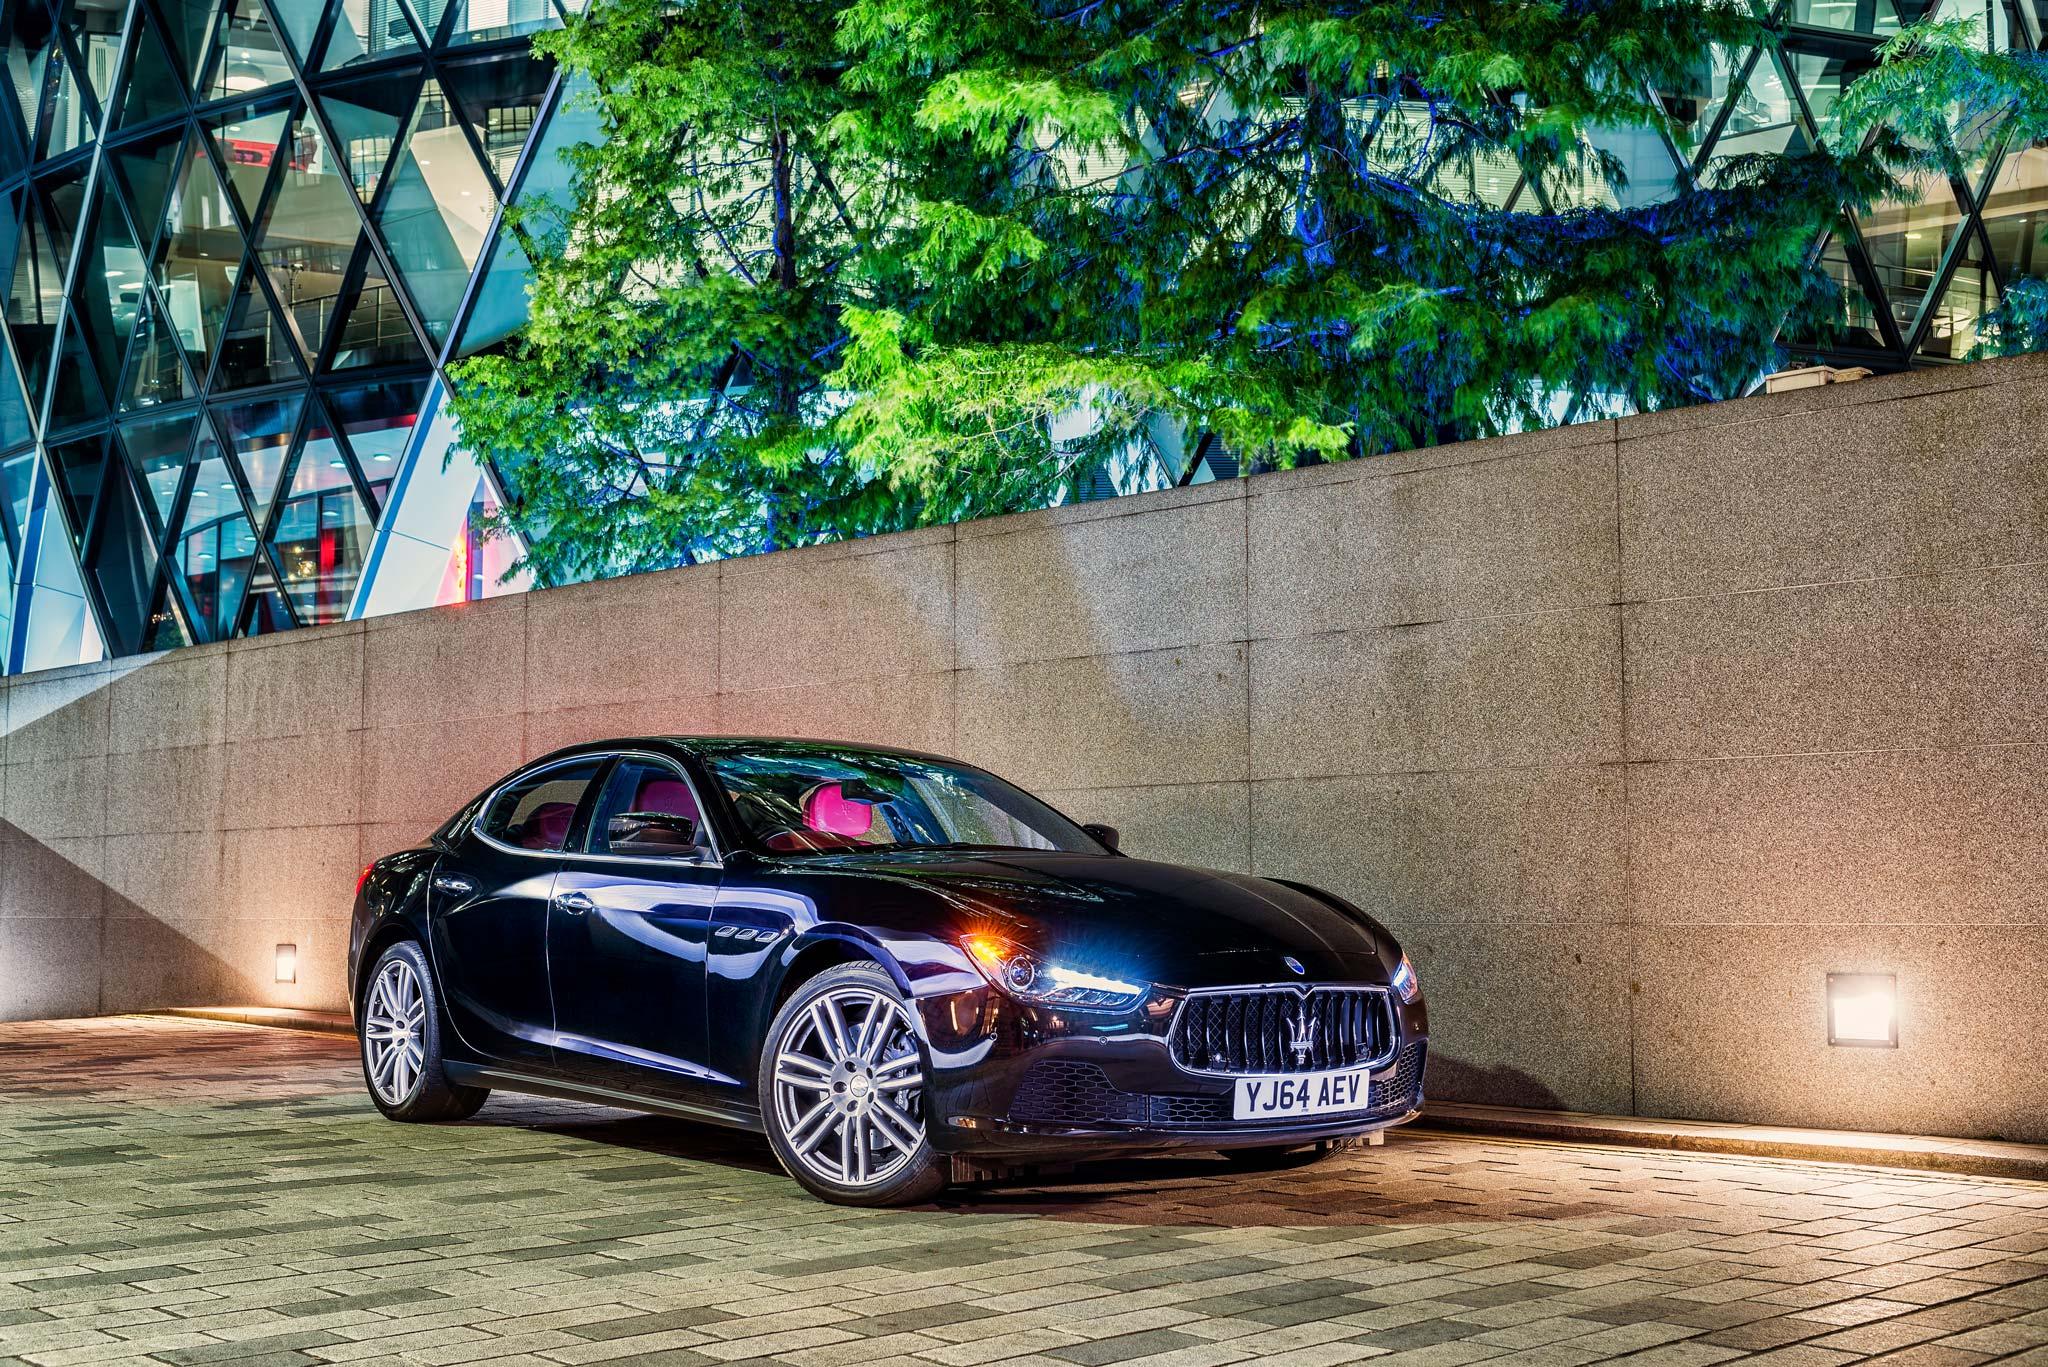 Maserati Ghibli Gherkin City of London